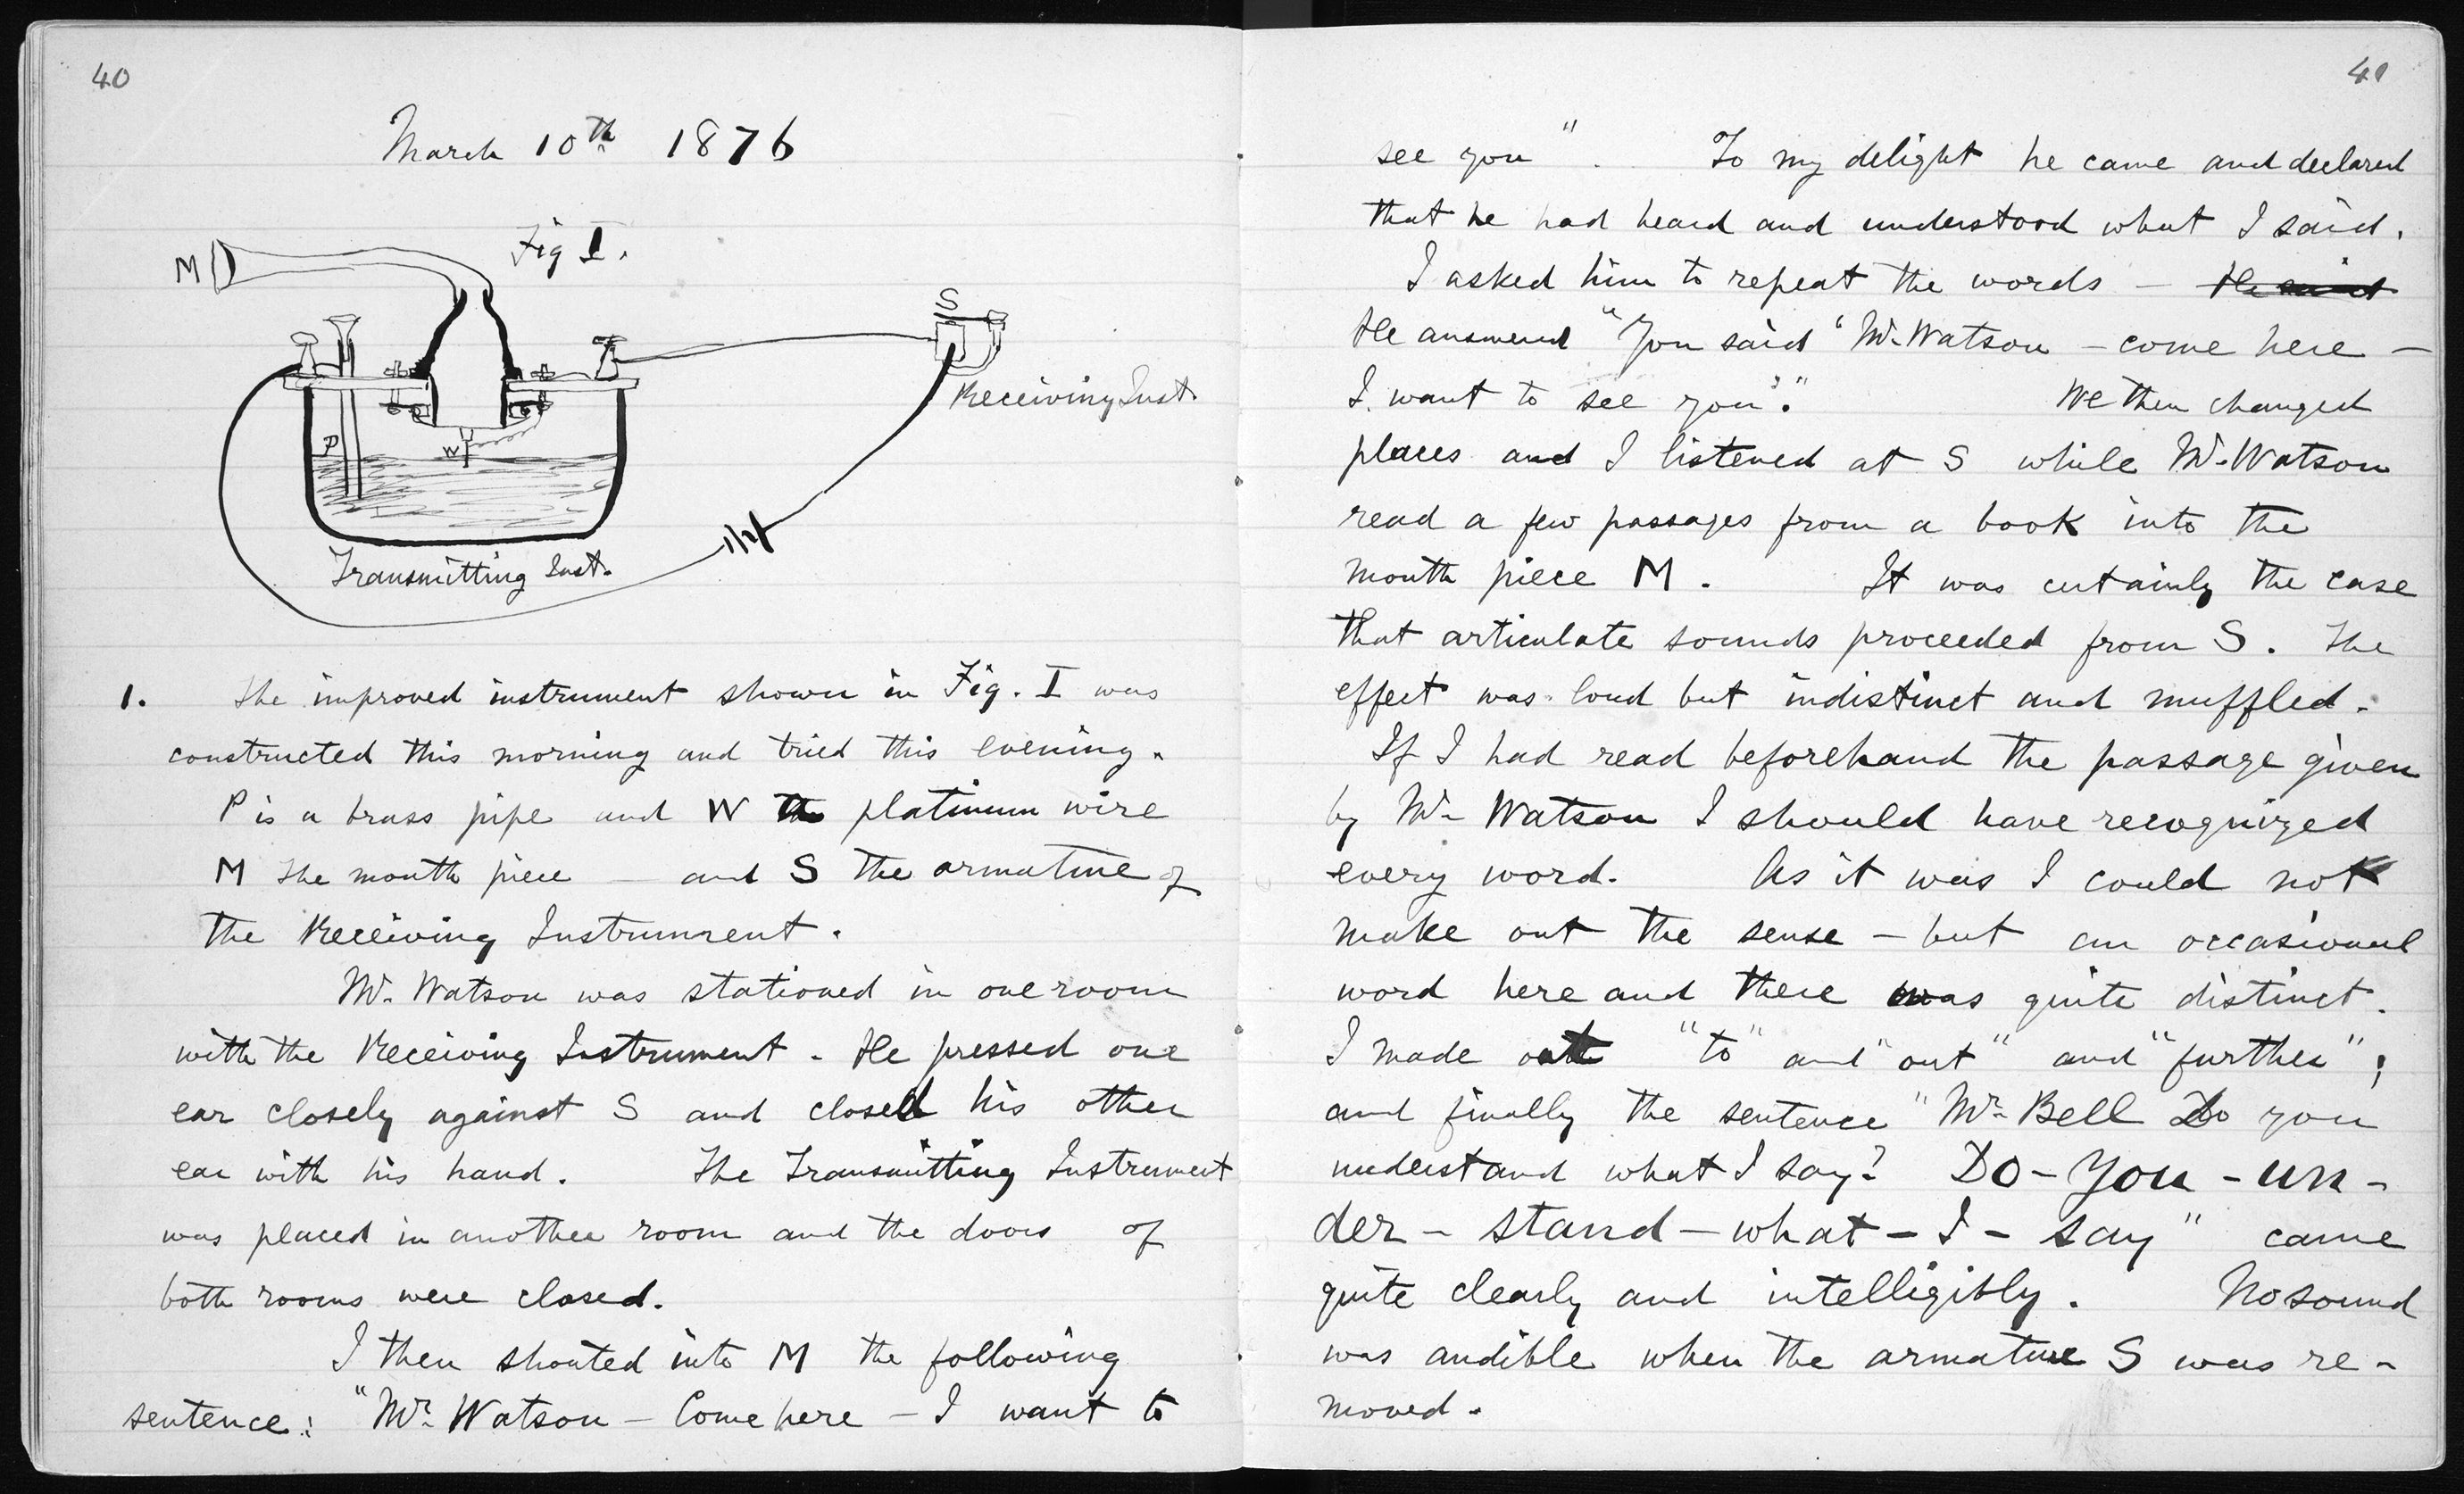 Alexander Graham Bell Lab Notebook - March 10, 1876